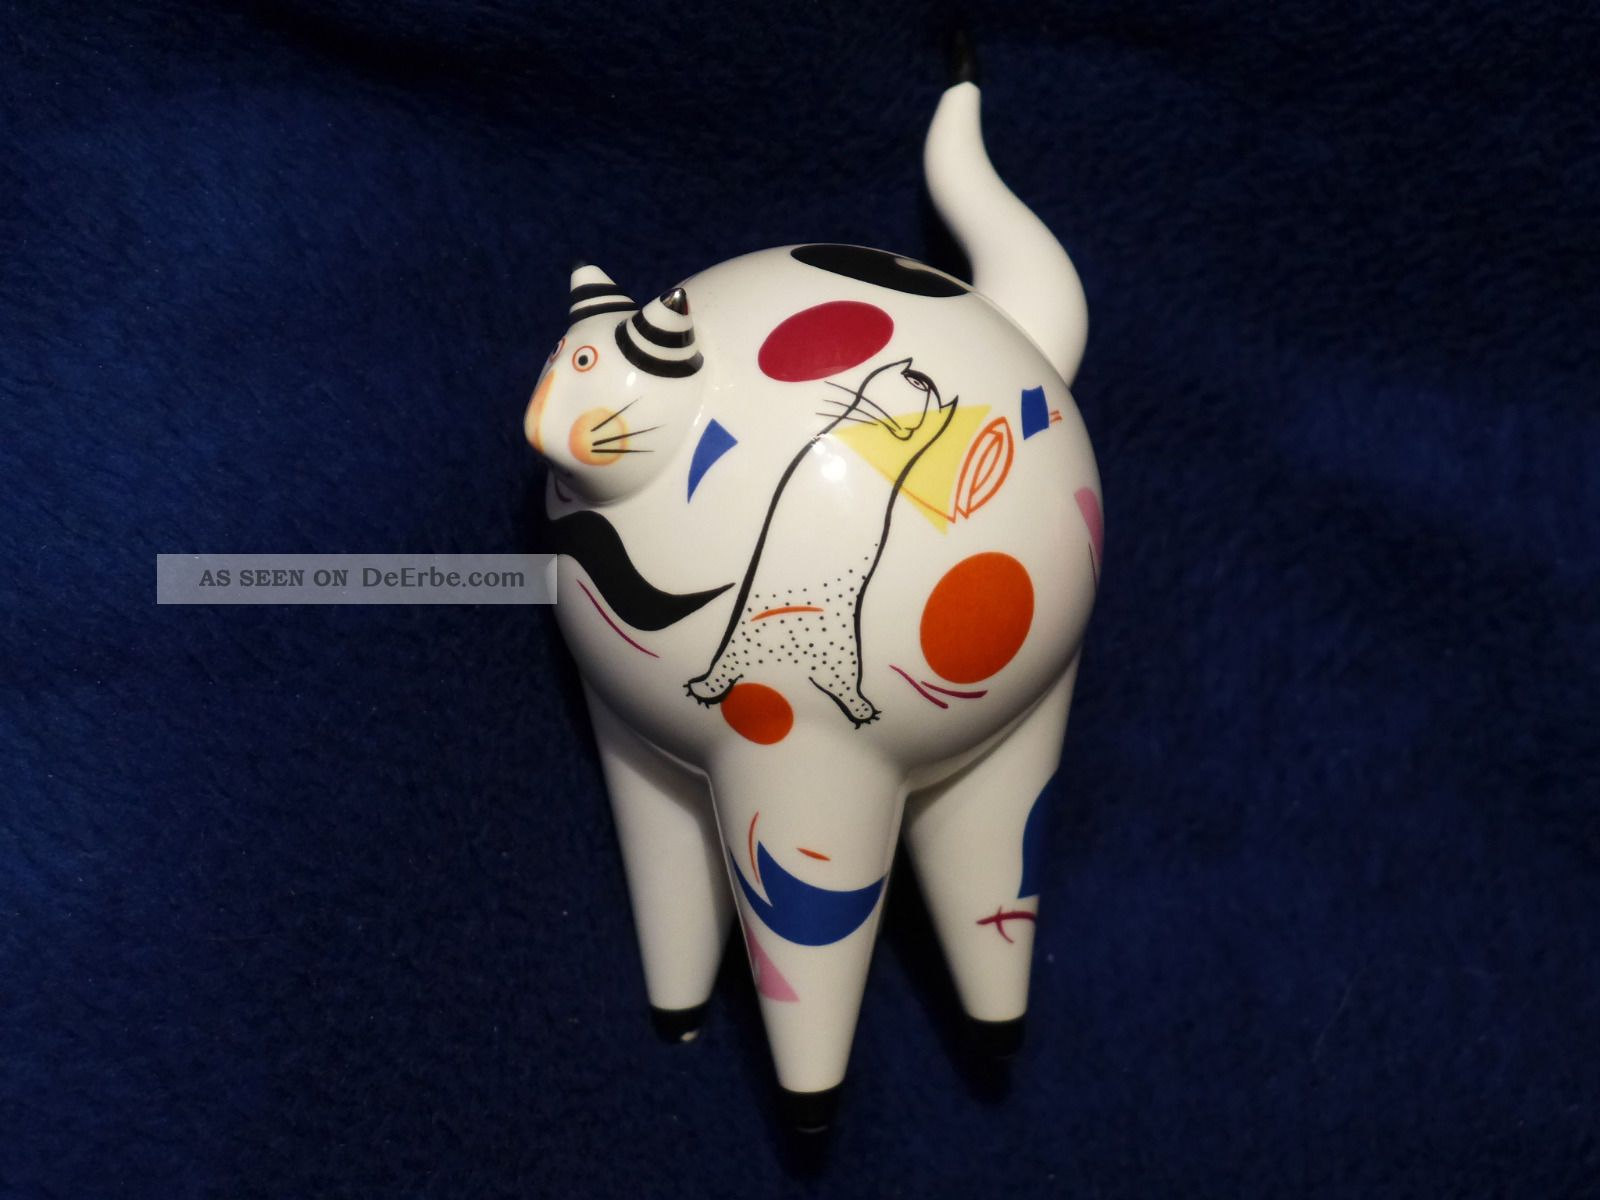 villeroy__boch__animal_park_cats_katze_1_lgw Luxus Villeroy Und Boch Keramik Dekorationen